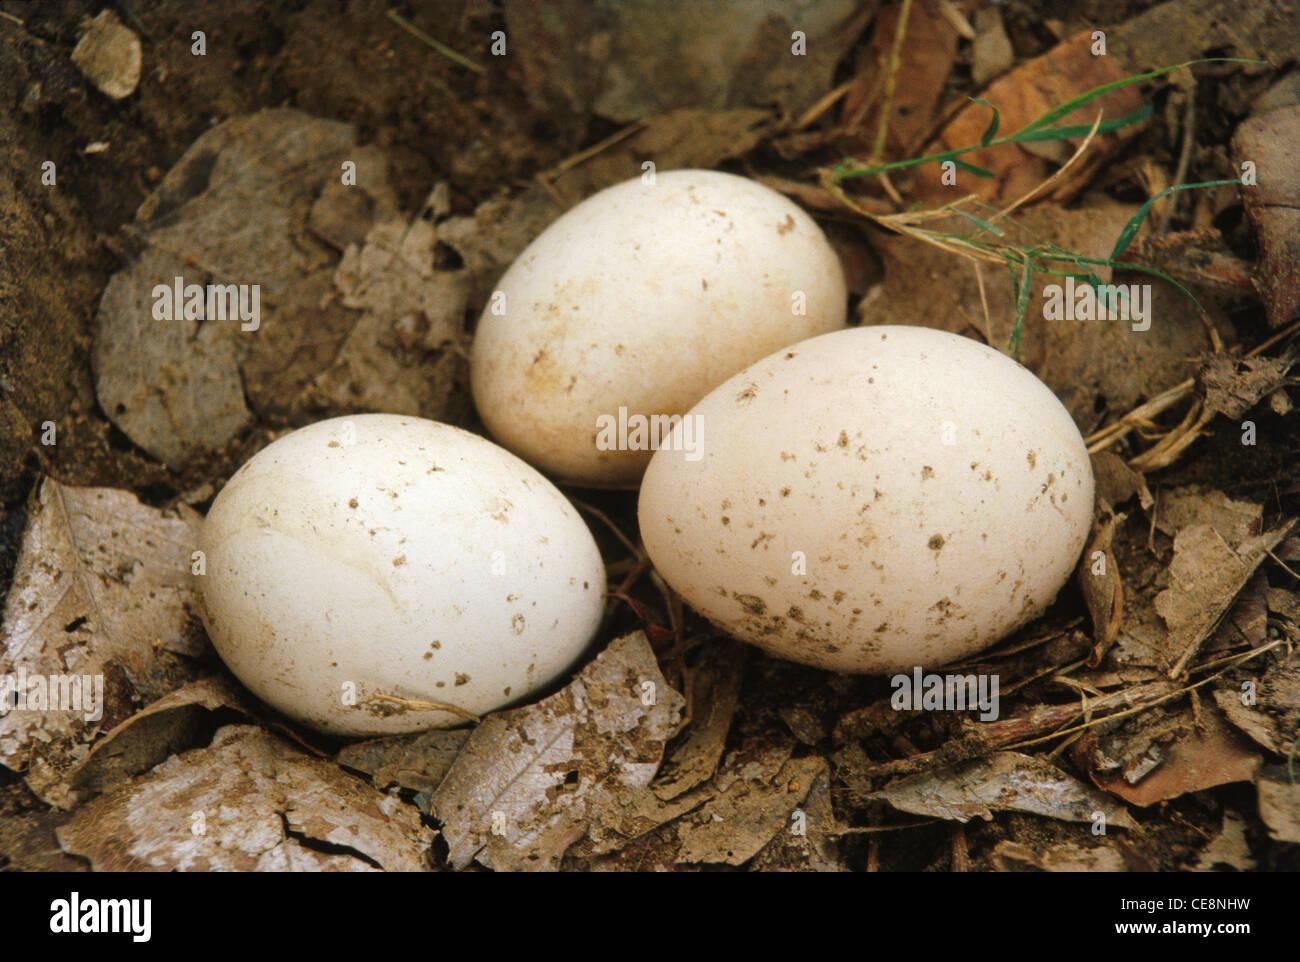 Birds Eggs Peacock Stock Photo, Royalty Free Image ...